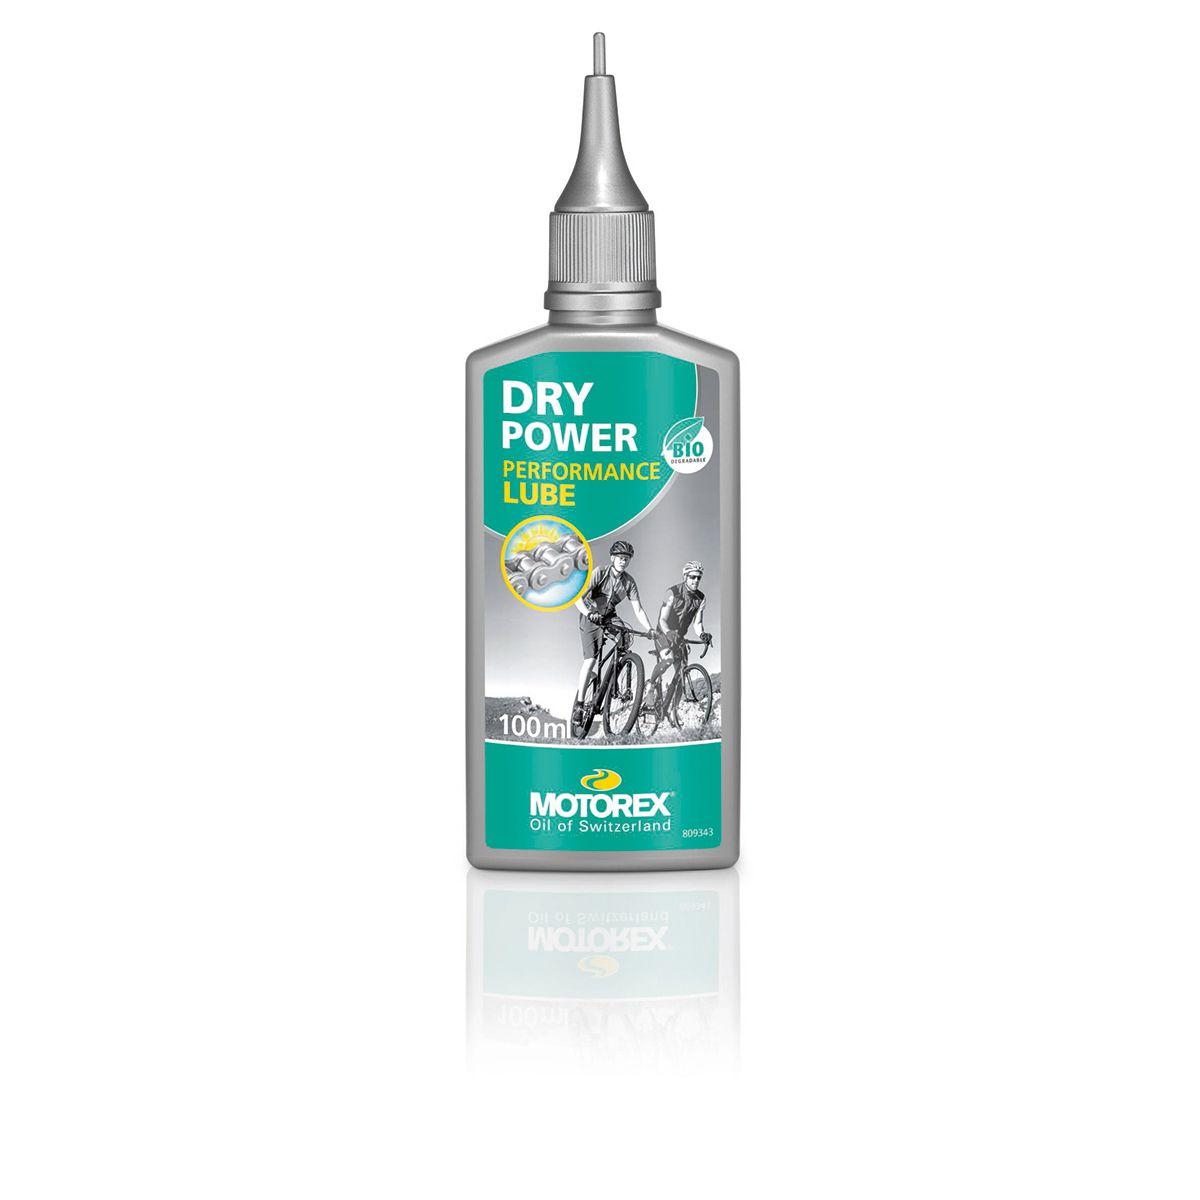 Motorex Dry Power Bottle 100ml